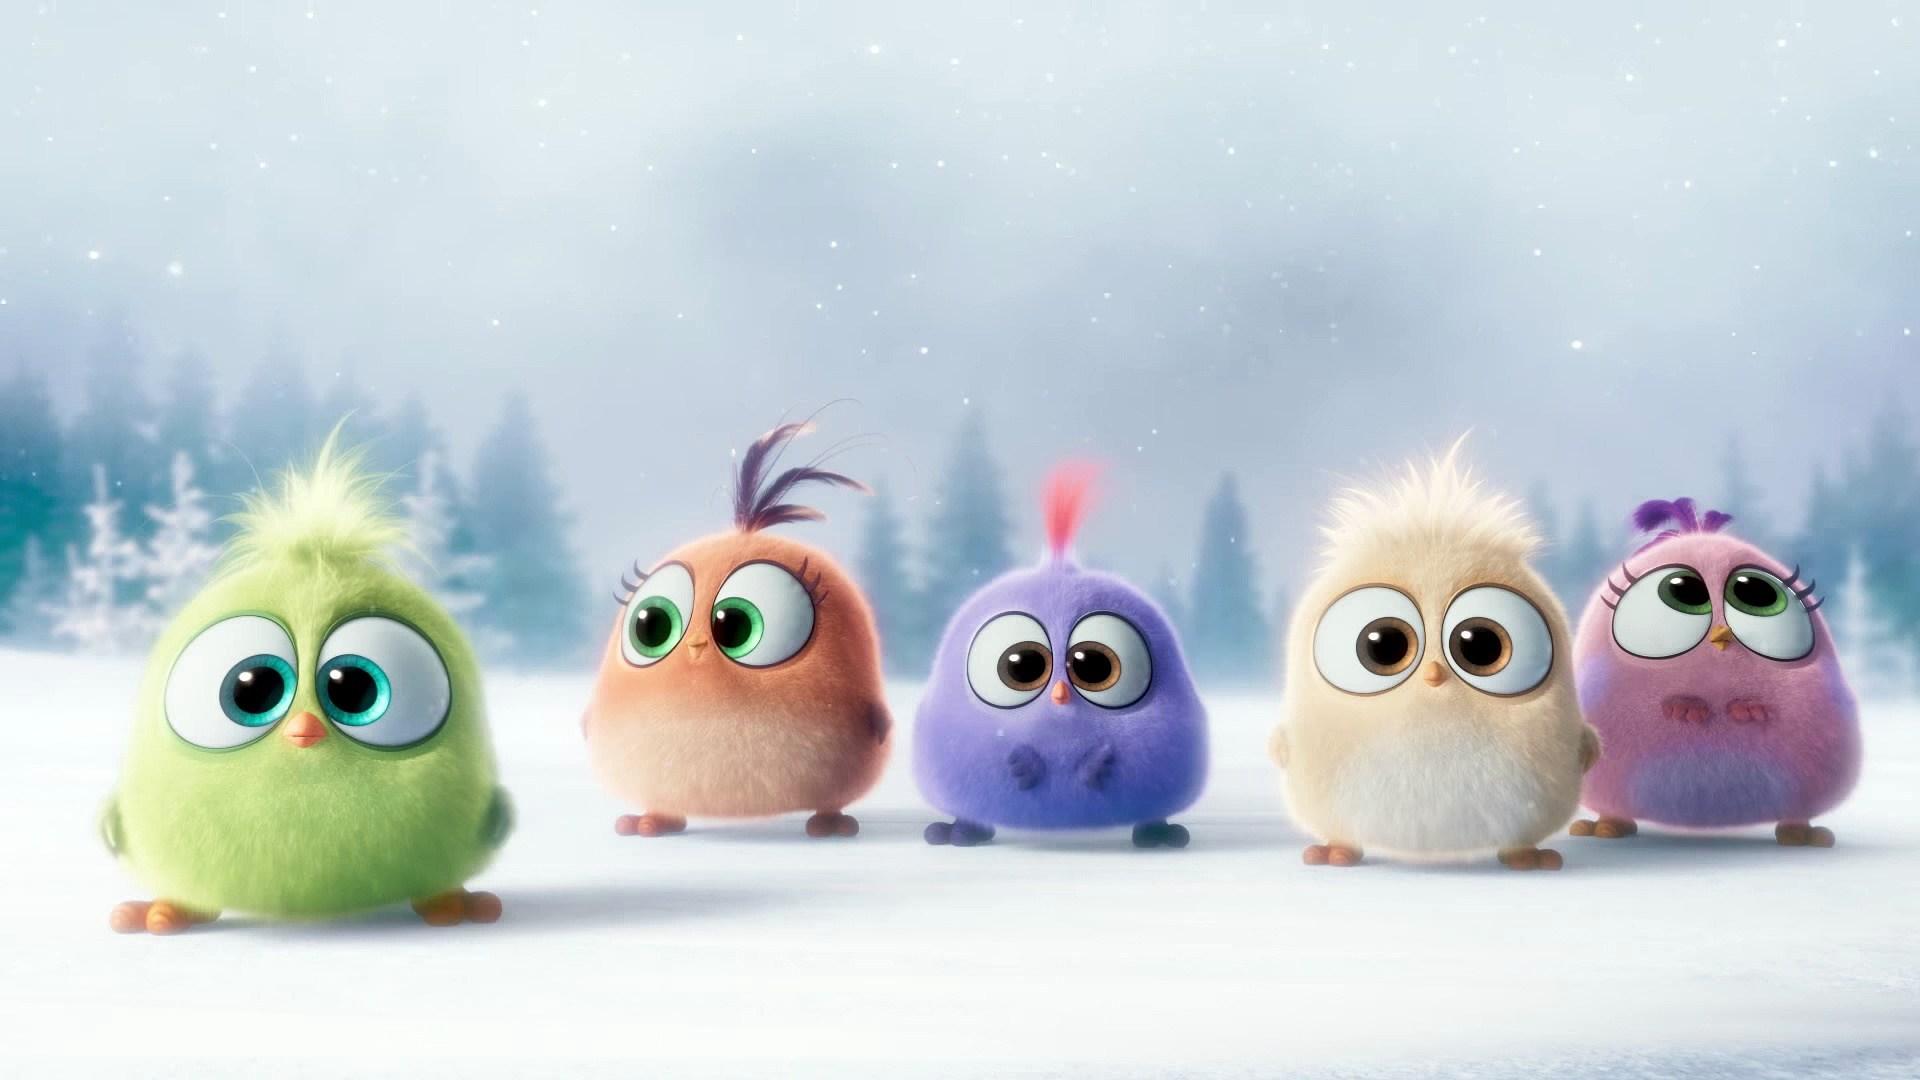 Cgi Angry Birds Angry Birds 1080p Hd Wallpaper Background - Cute Angry Birds Baby , HD Wallpaper & Backgrounds